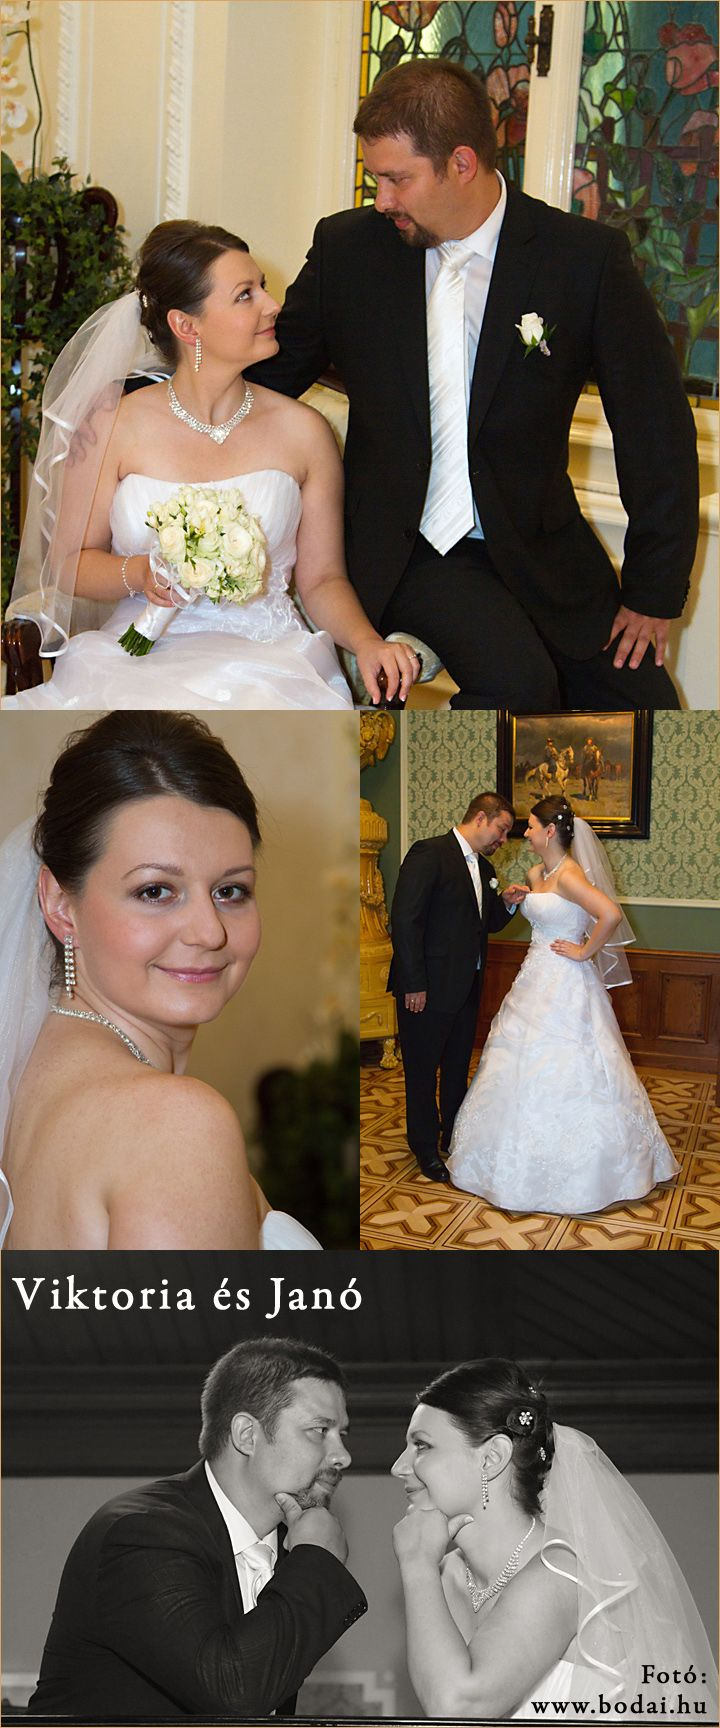 Esküvői fotók a Hubai teremben  http://www.bodai.hu